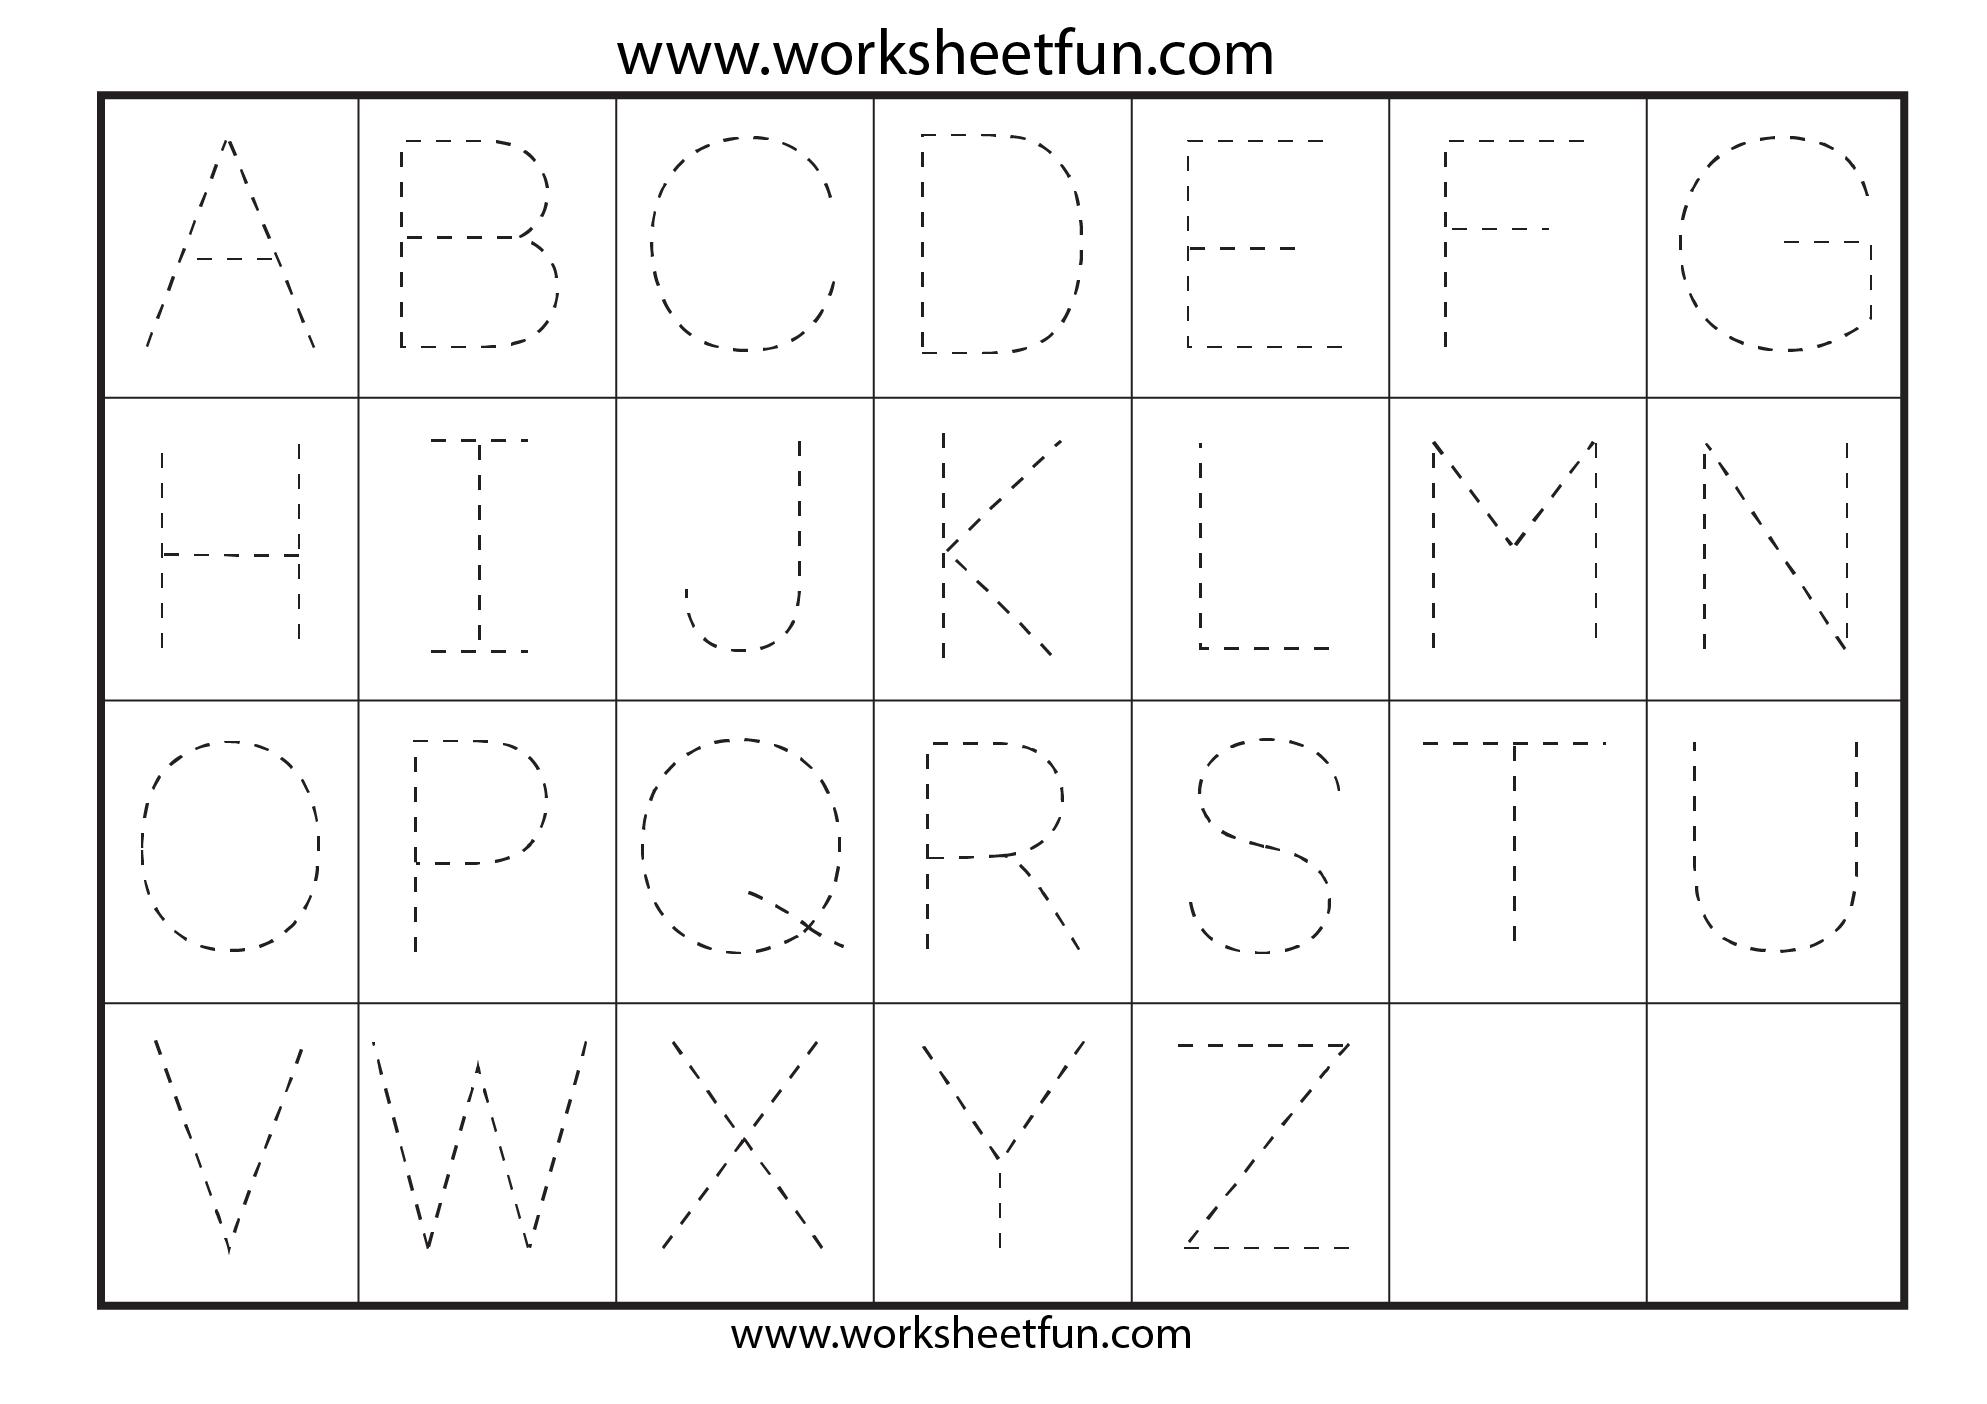 Letter Tracing Worksheets For Kindergarten - Capital Letters with regard to Alphabet Tracing For Kindergarten